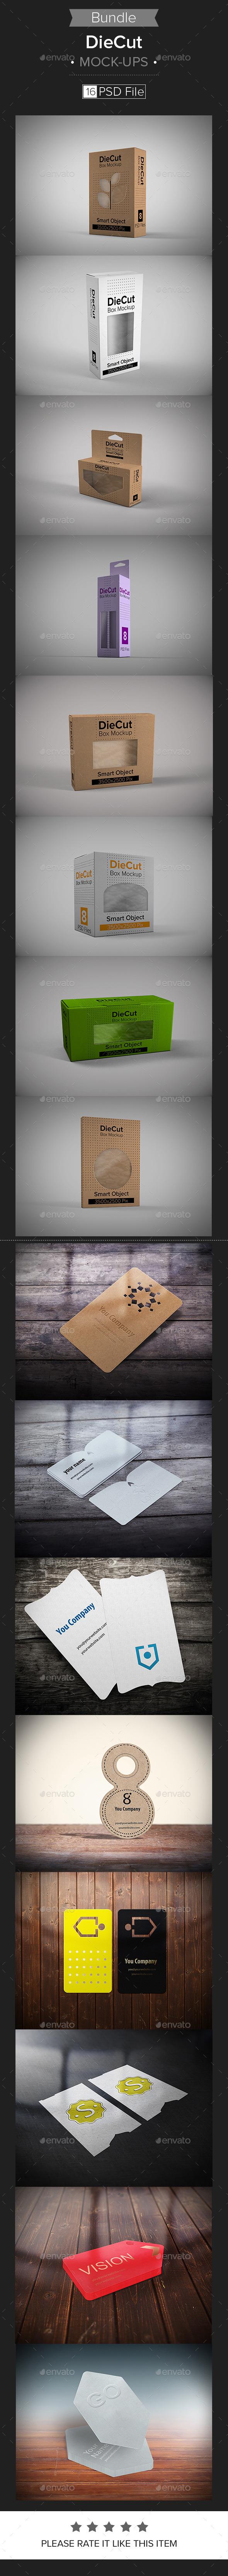 DieCut Mock-Up Bundle - Print Product Mock-Ups